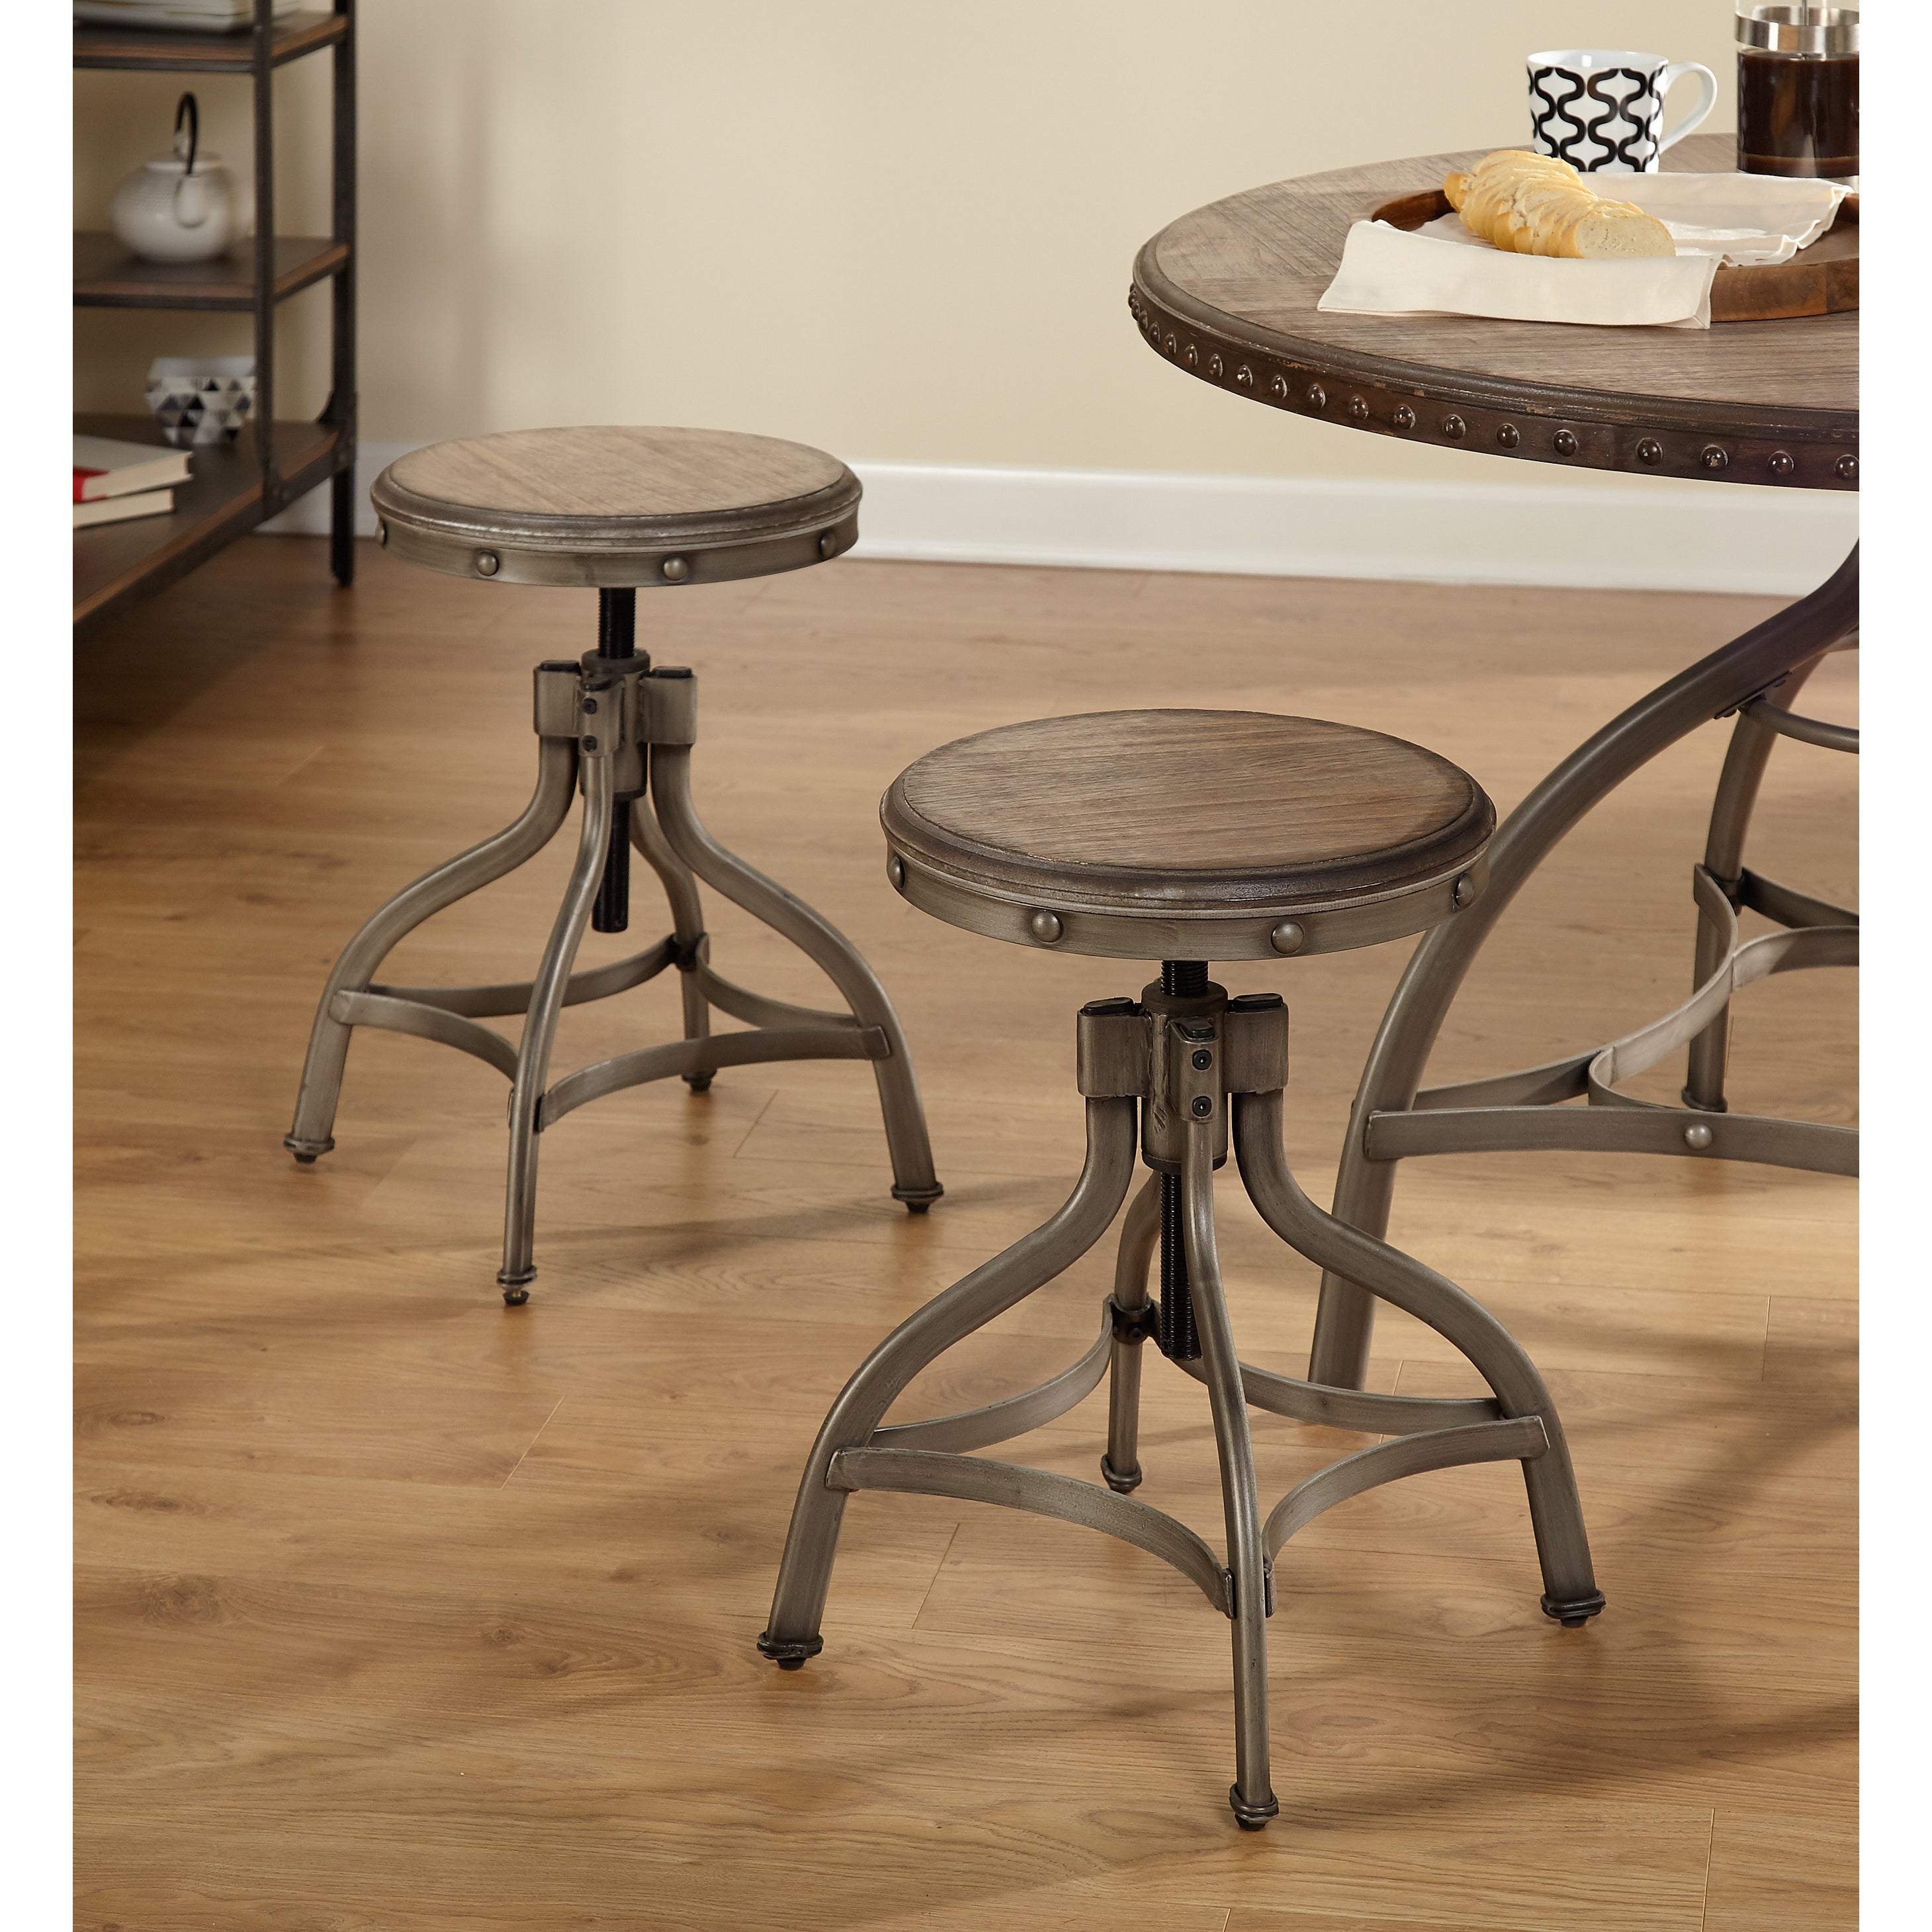 Swivel Bar Stool Pewter Wood Seat Height Adjustable Rustic